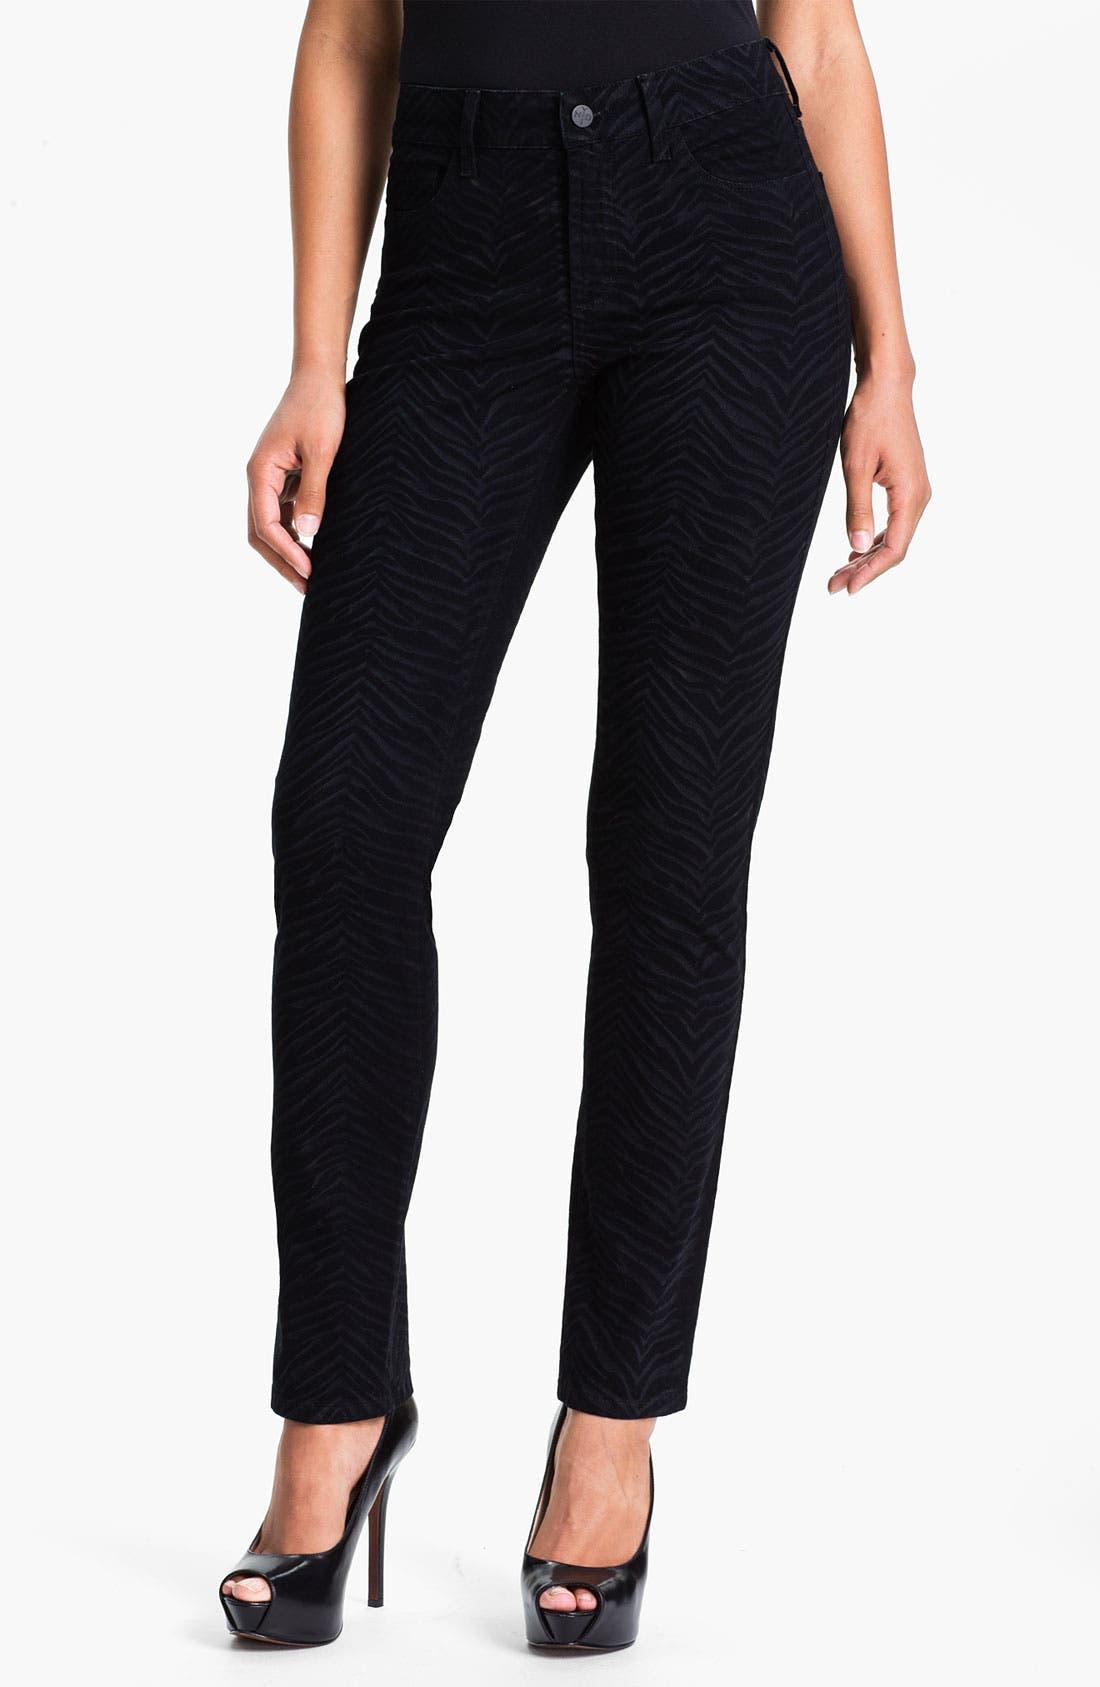 Main Image - NYDJ 'Sheri - Zebra' Print Twill Skinny Jeans